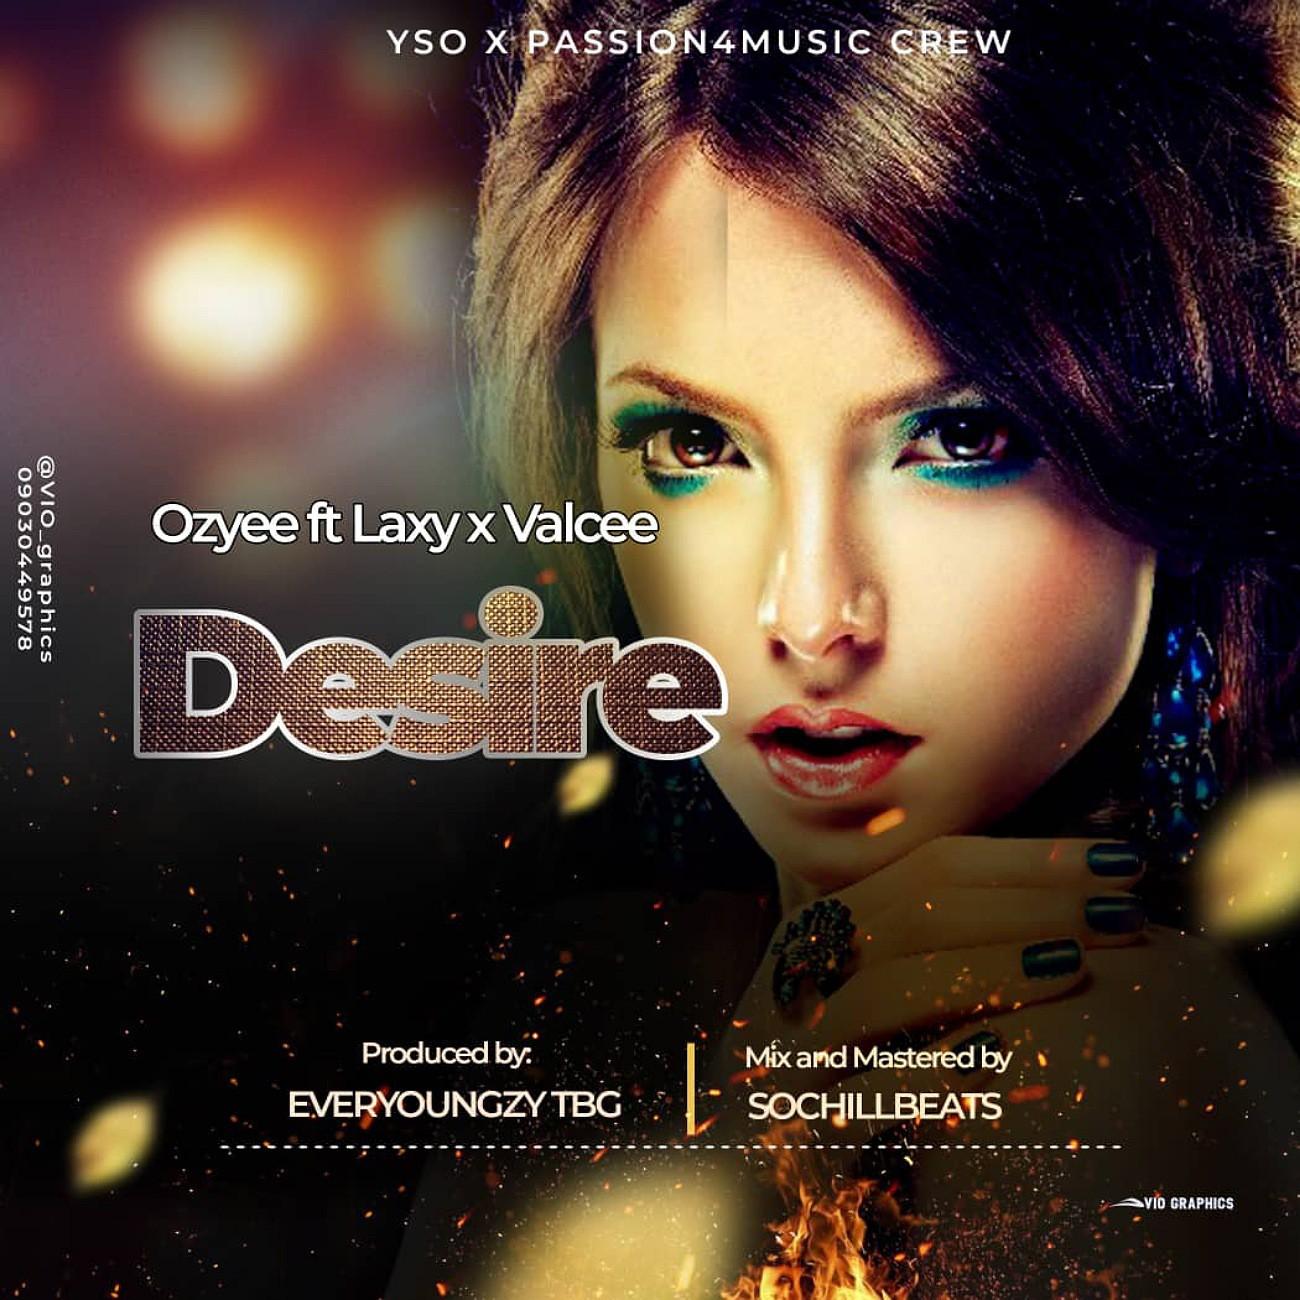 Ozyee – Desire ft. Laxy, Valcee